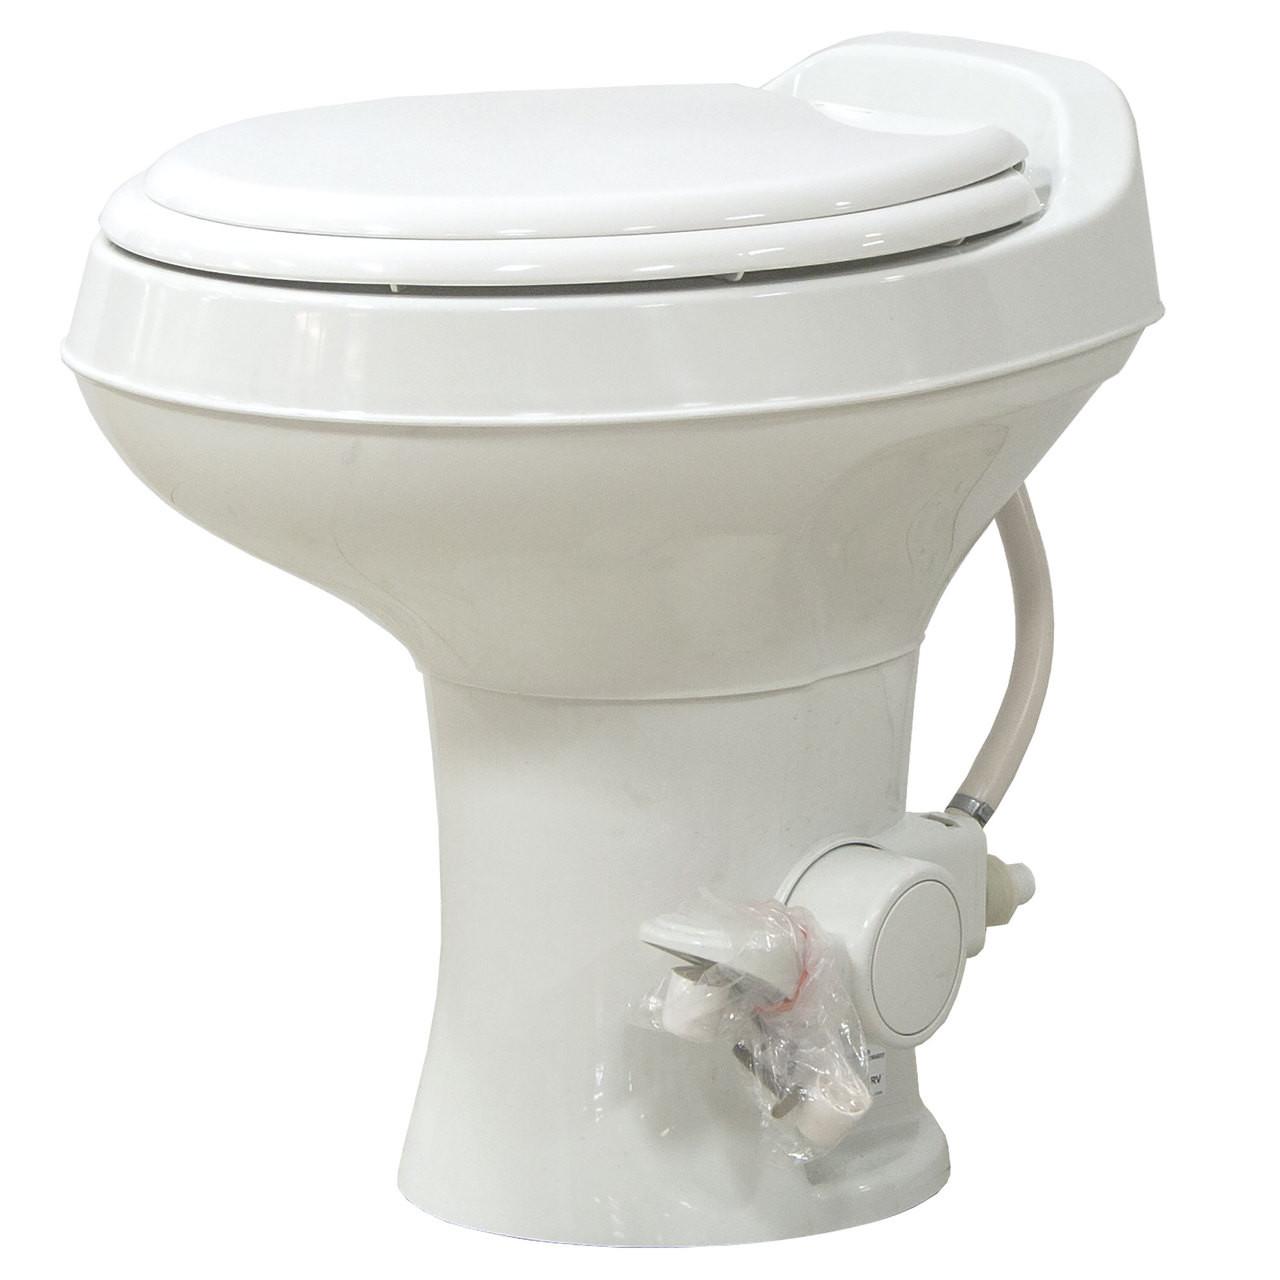 Dometic 300 Gravity Flush RV Toilet